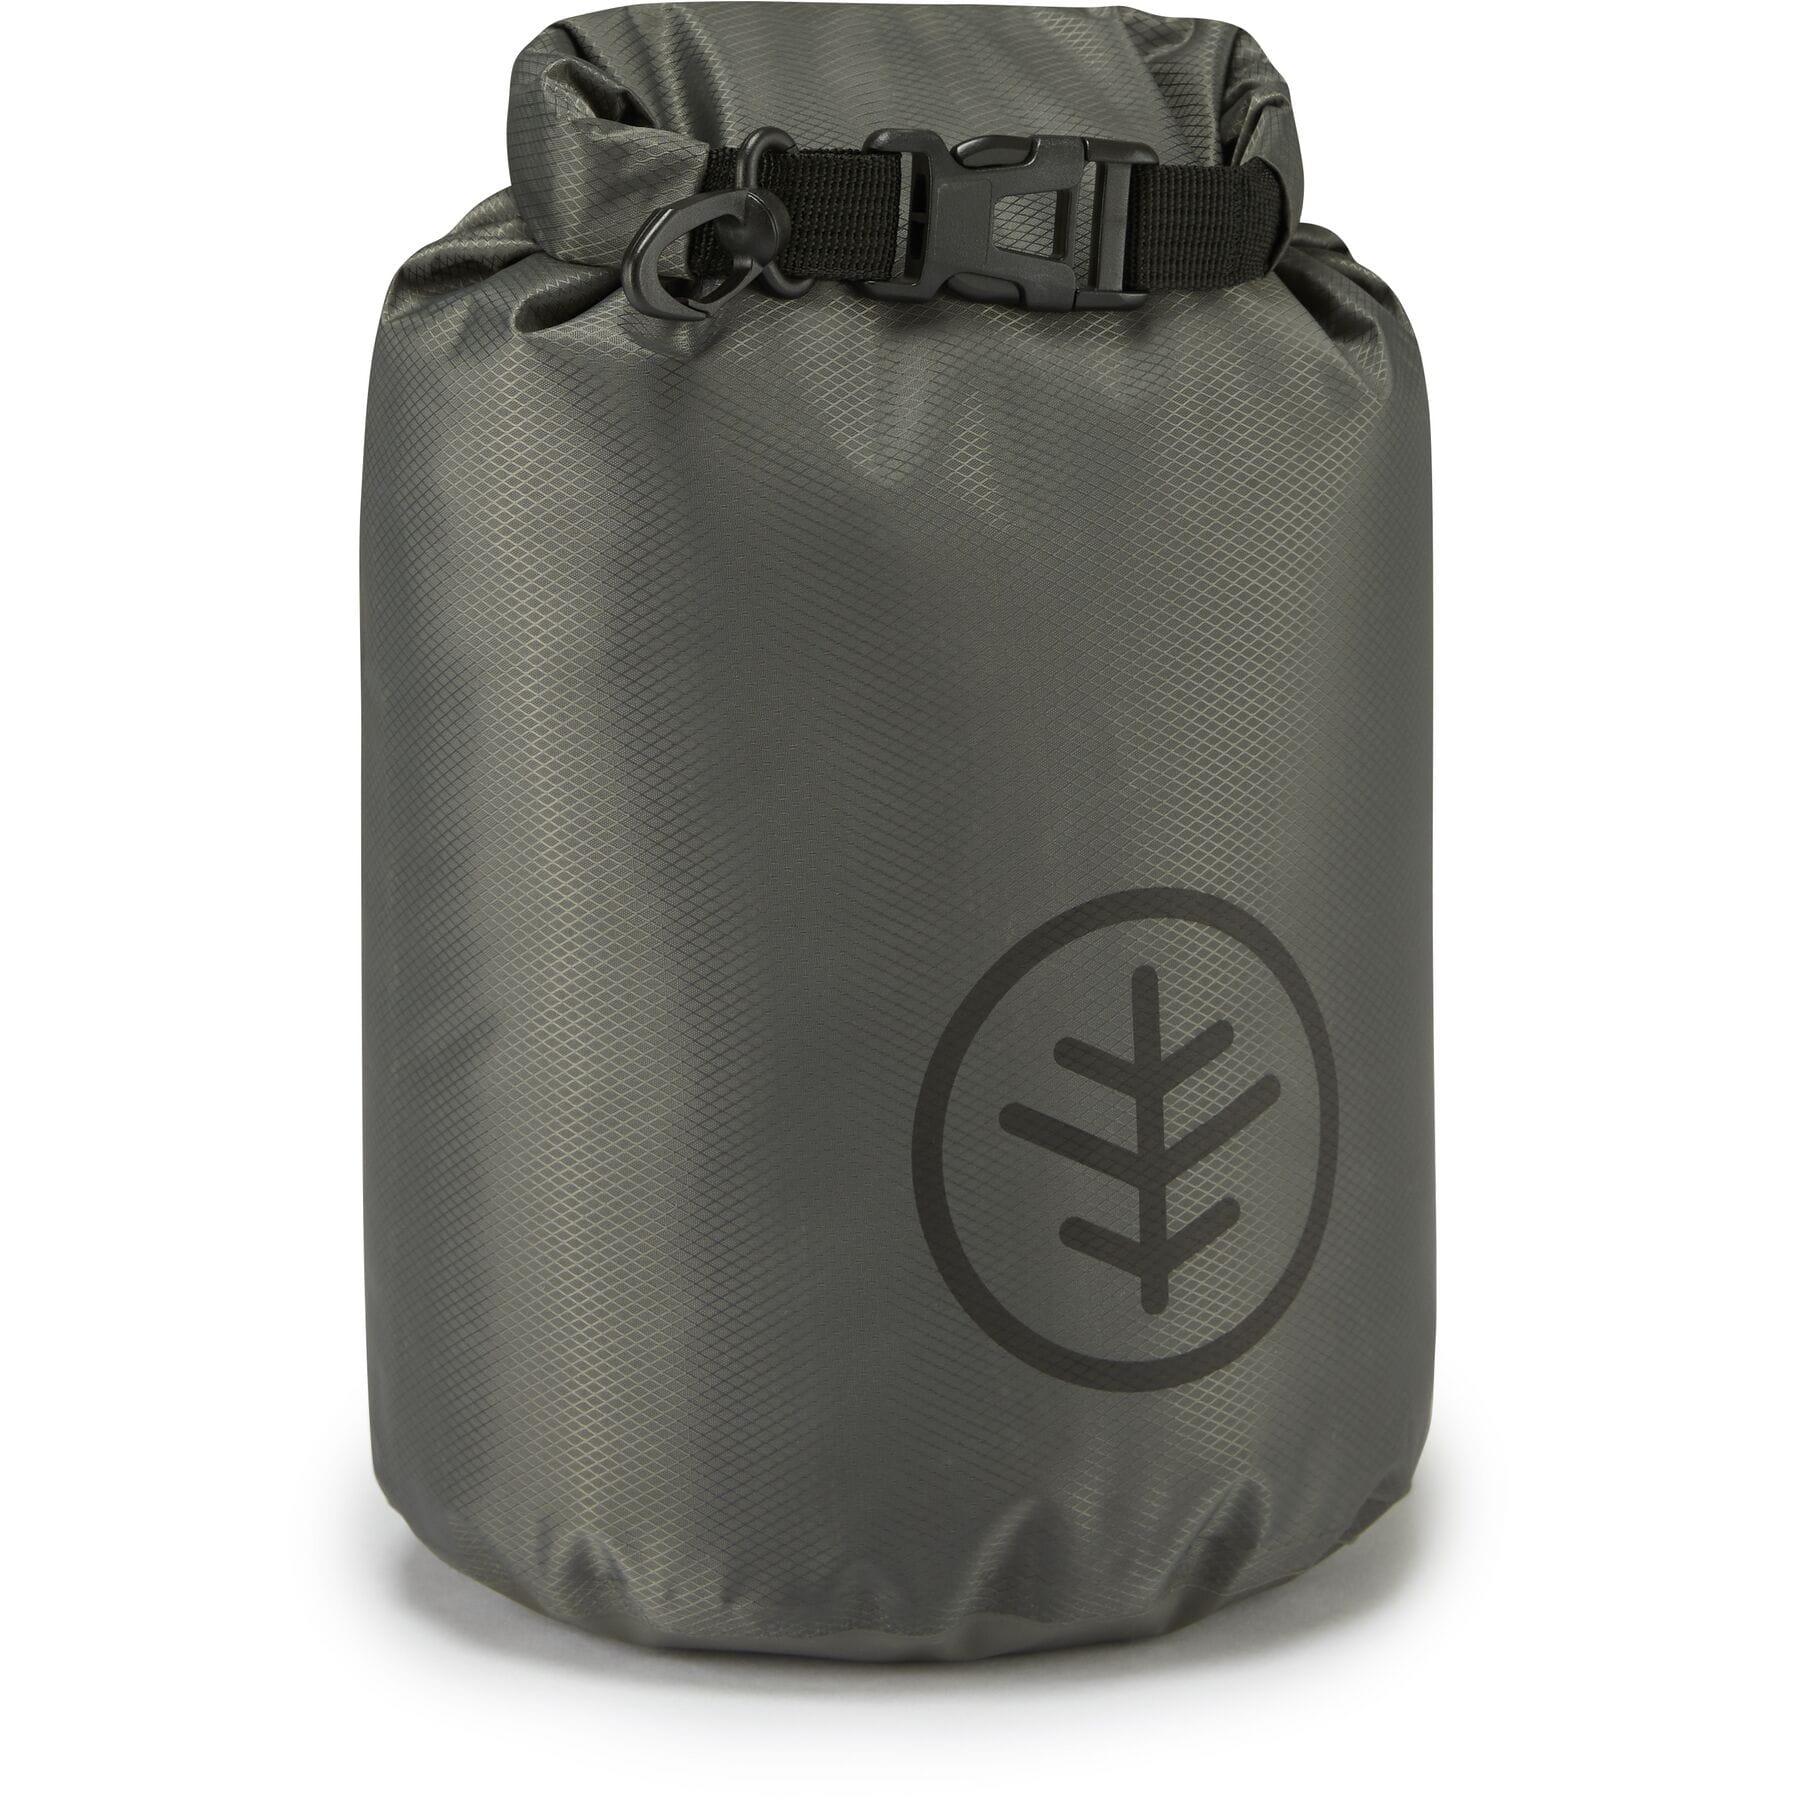 Vak Wychwood Dry Bag 5ltr